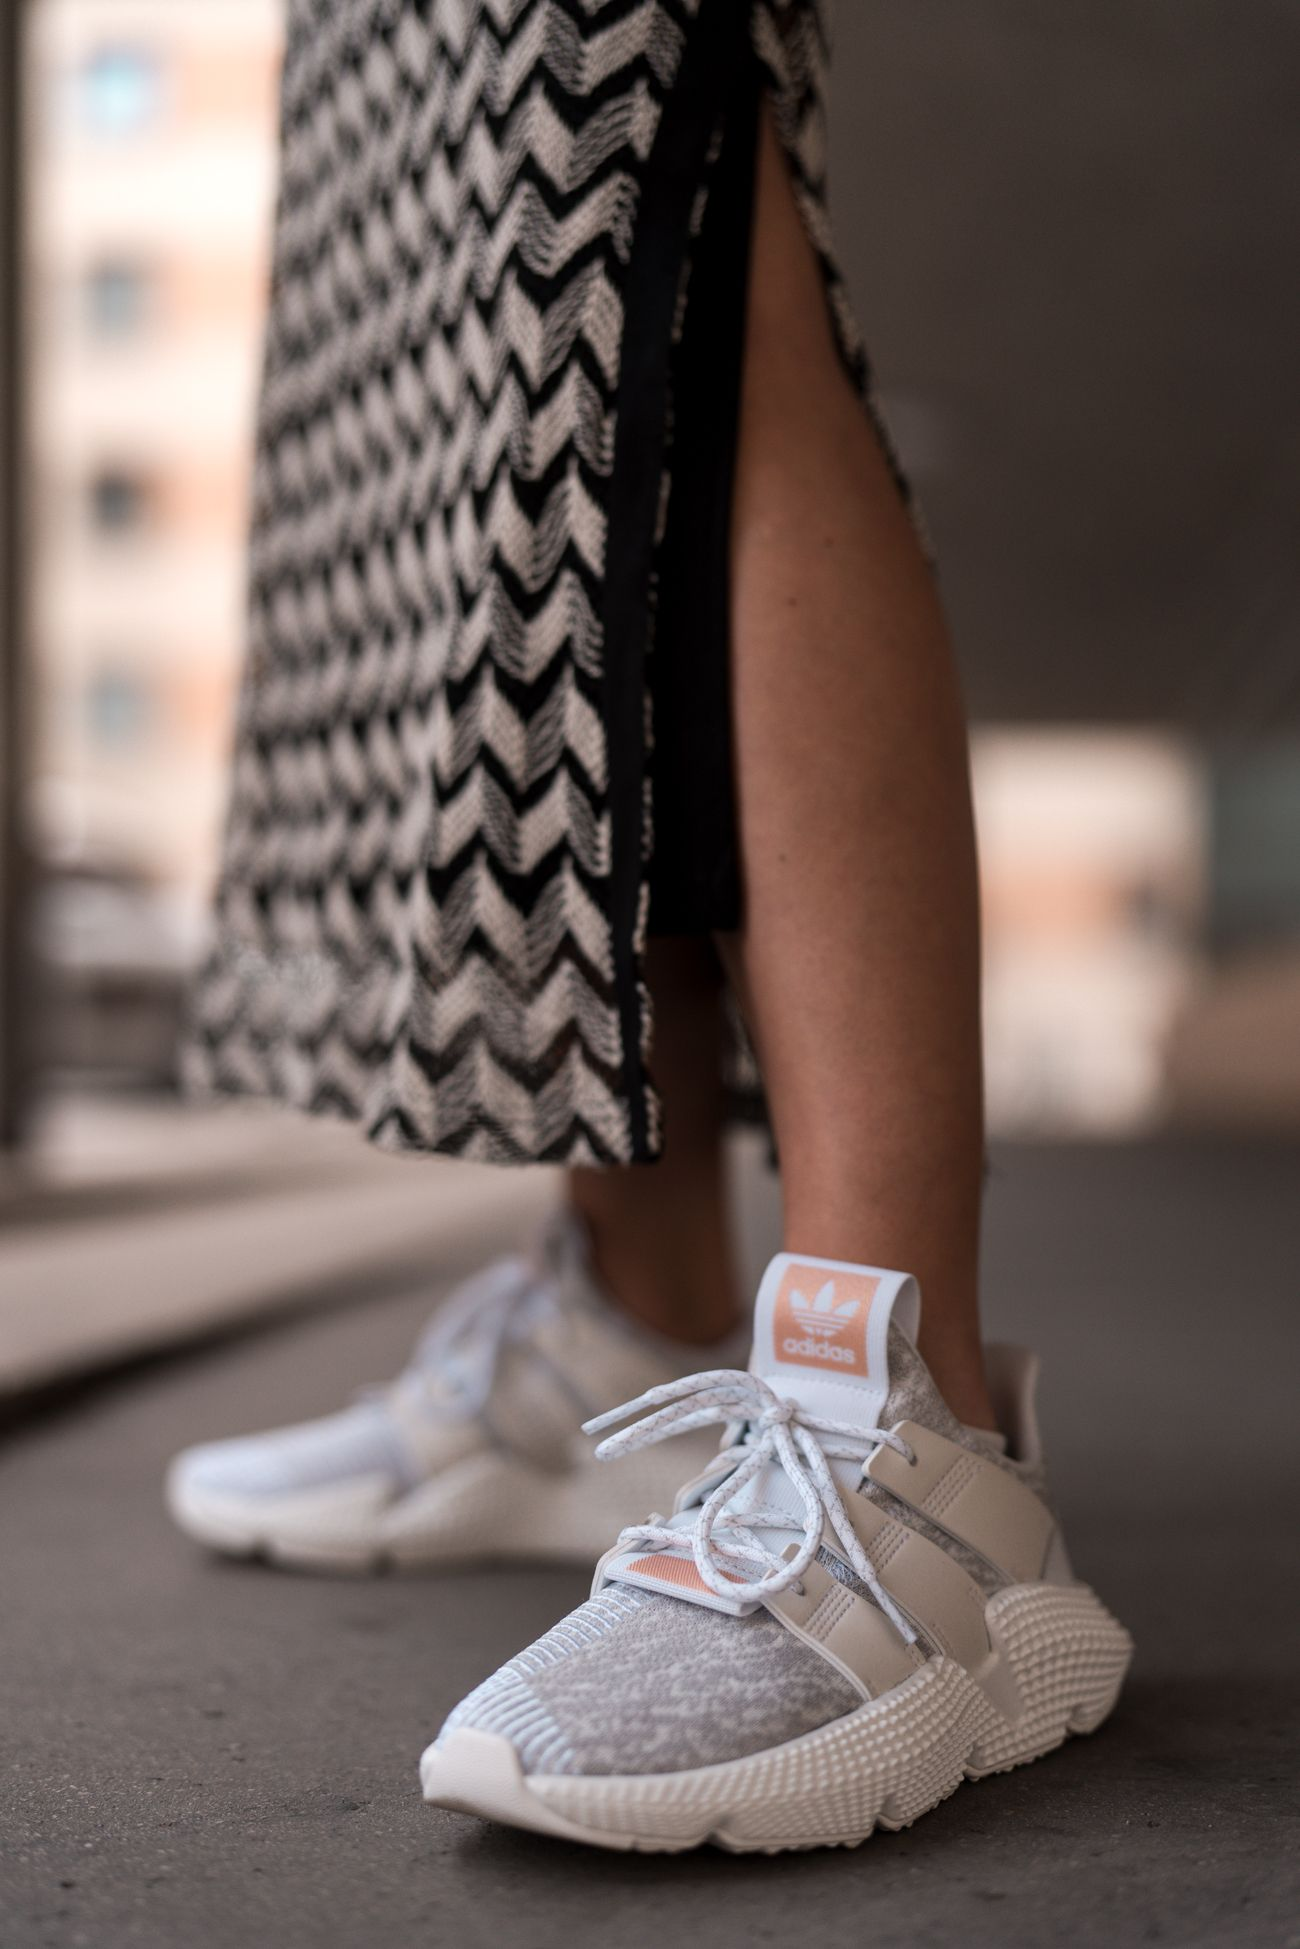 Ugly Sneaker Trend Adidas Prophere Dad Sneaker Zara knit dress Strickkleid  Belt Bag Modeblog Heidelberg Deutschland fashion blog Germany Sariety.com  Sarah ... e0f2b2f62